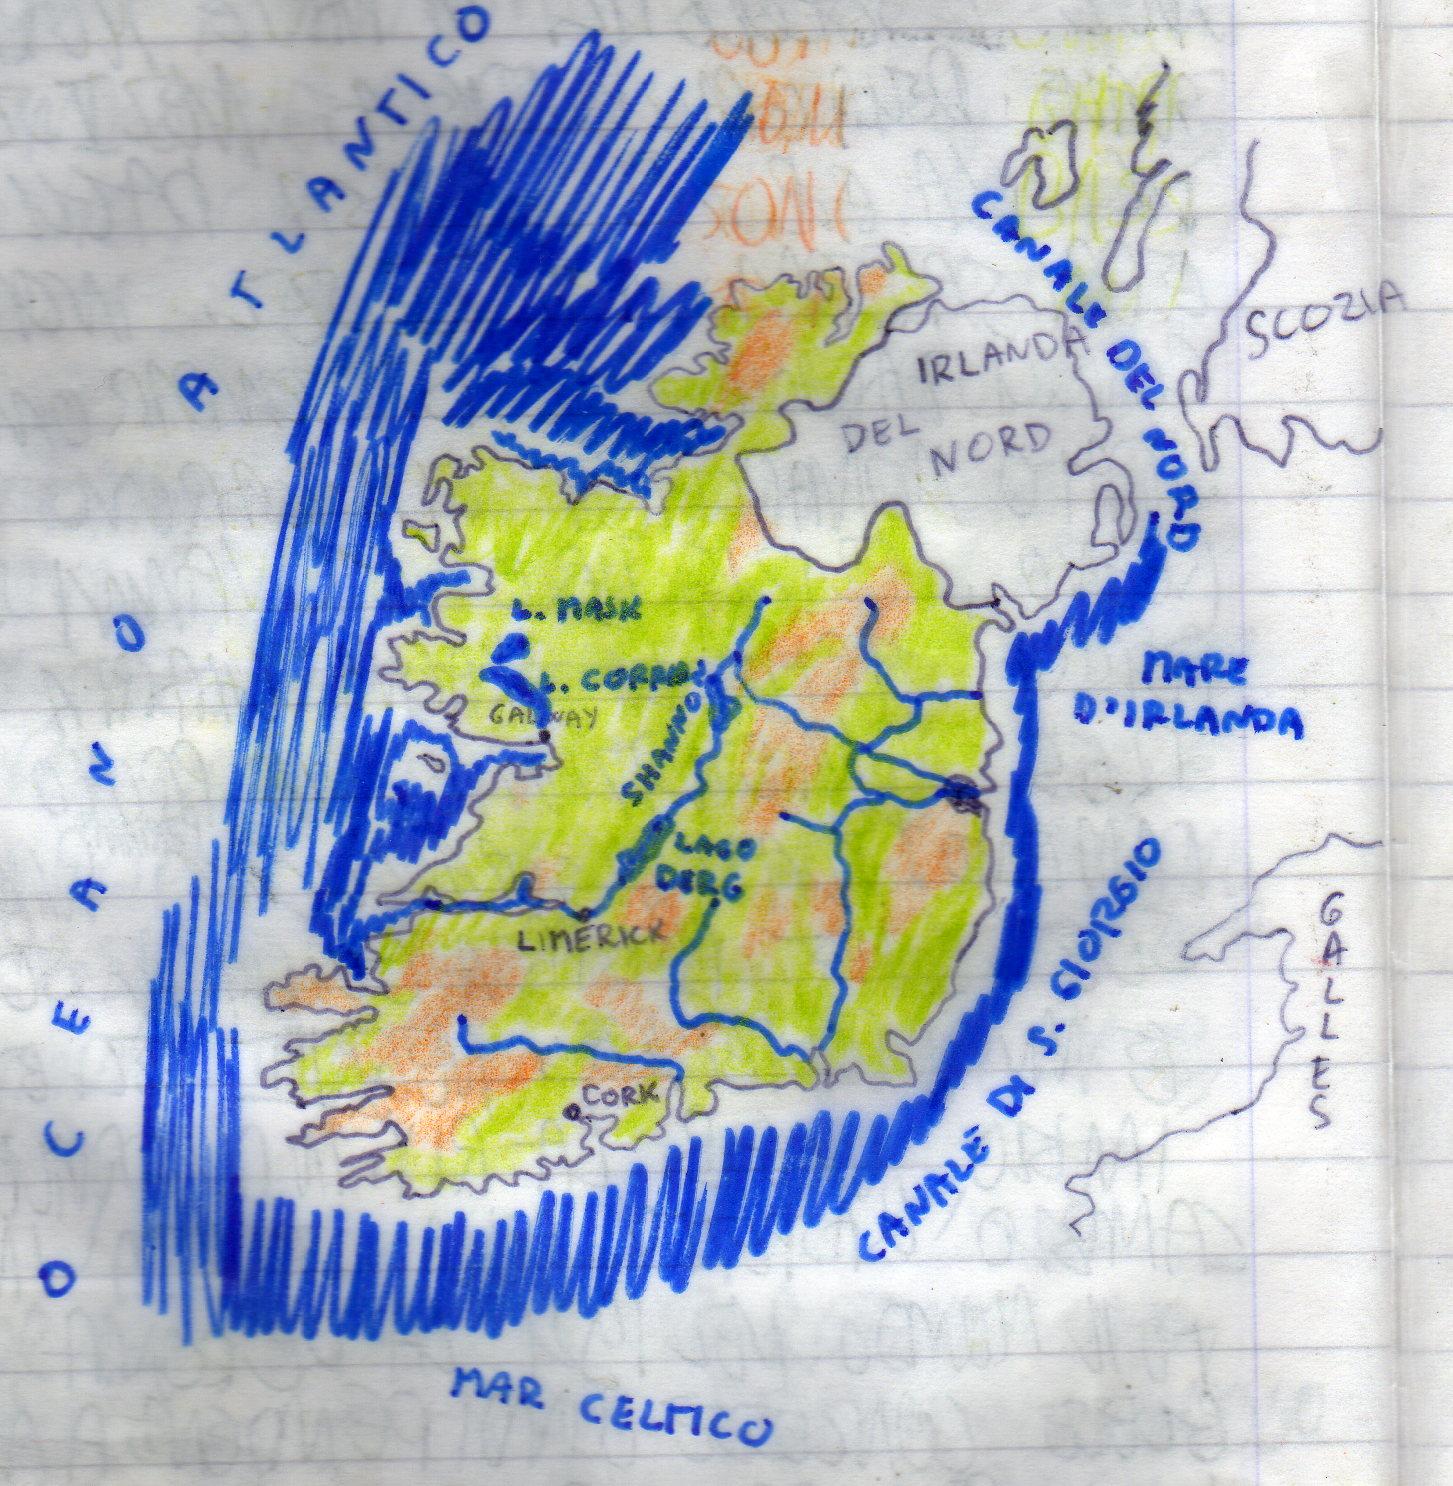 Cartina Politica Dell Irlanda.Ucraina